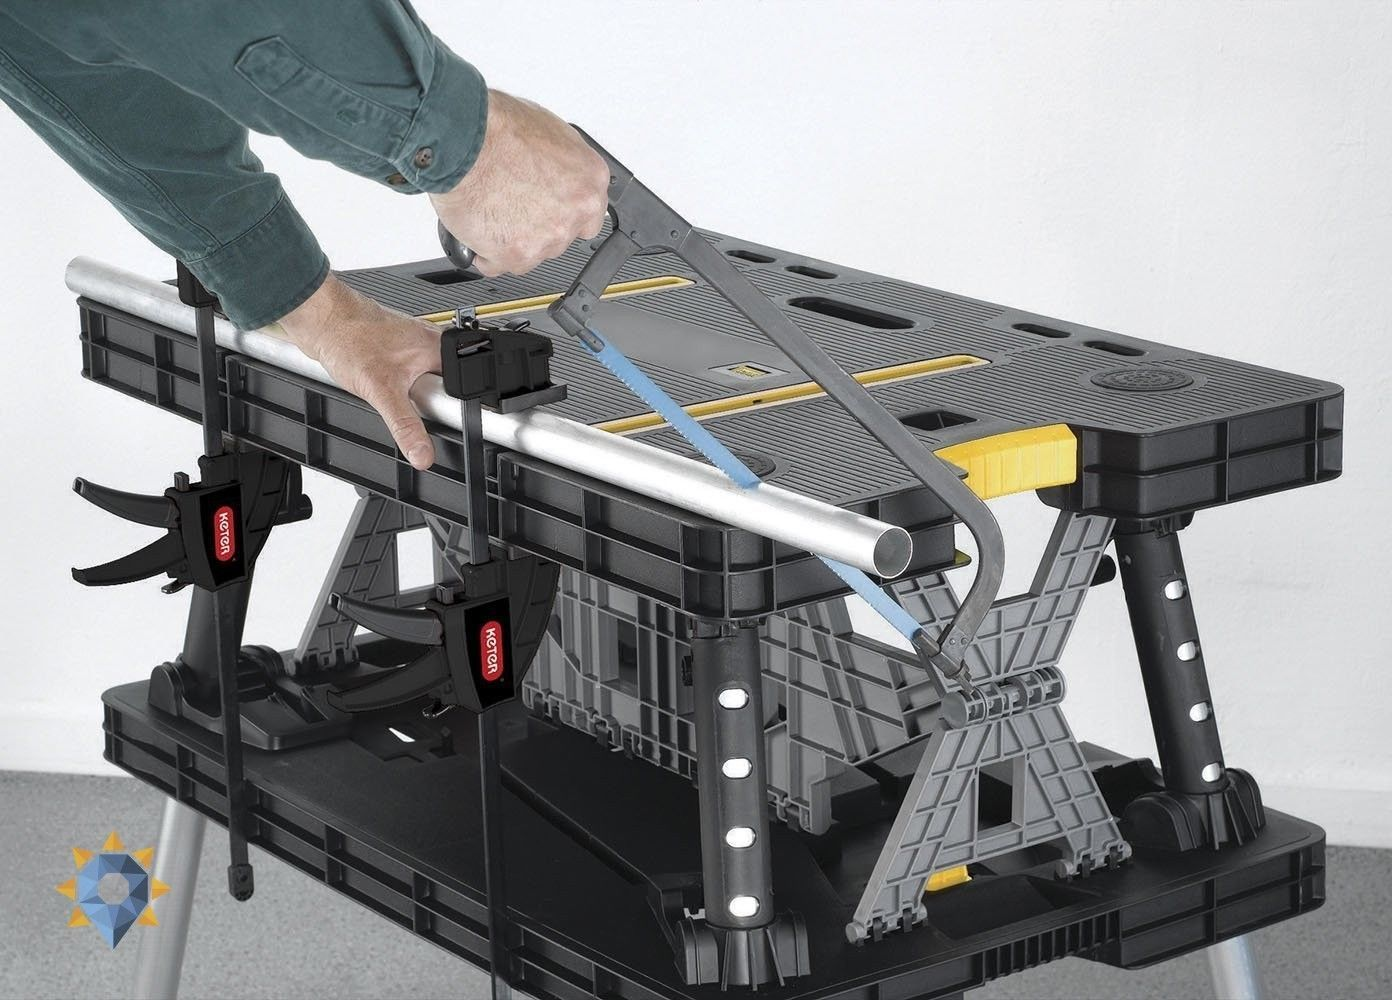 Portable Work Station Folding Saw Horse Mobile Table Bench Garage Diy Tools Diy Tools Mobile